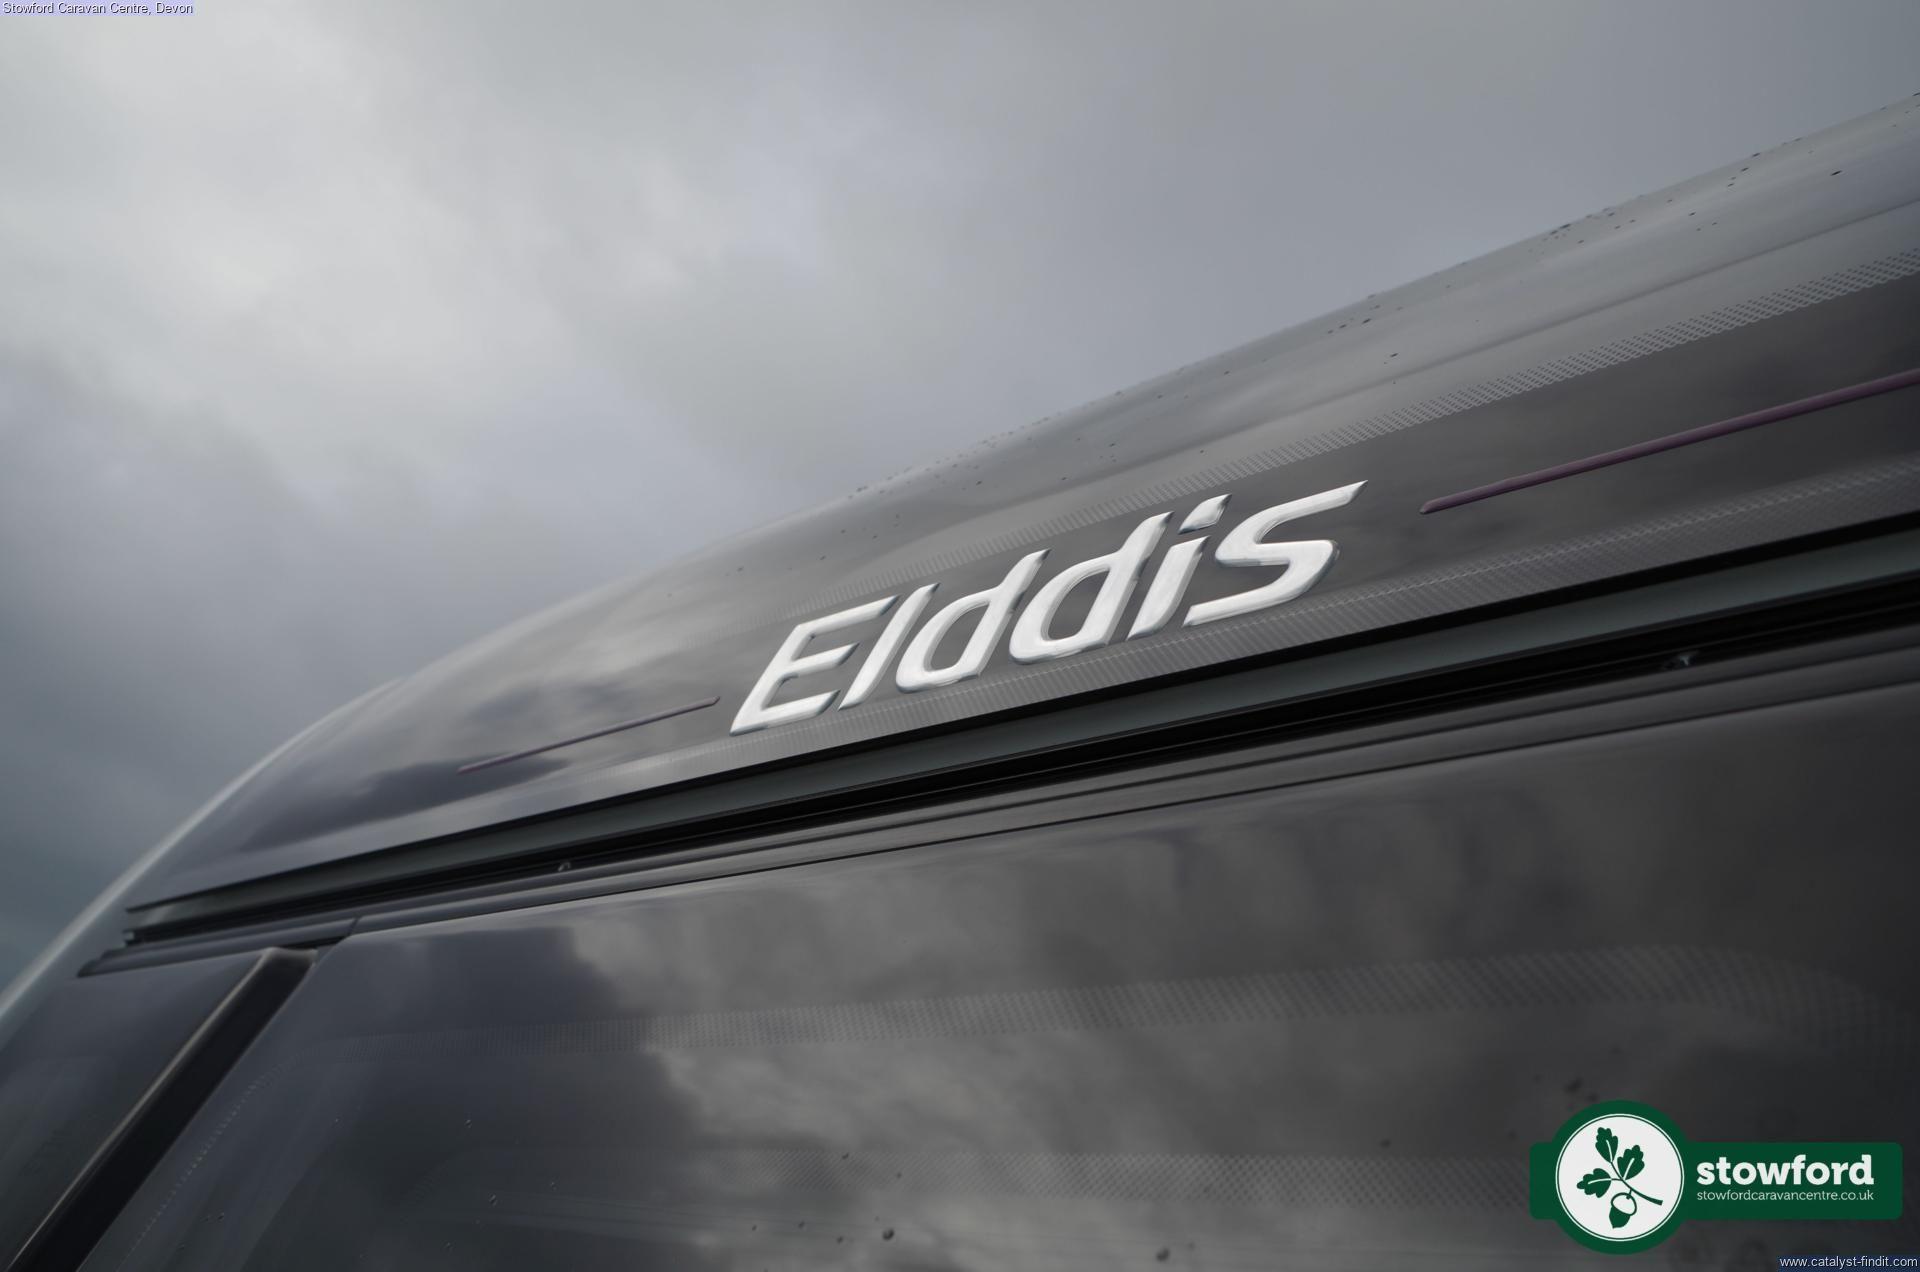 Elddis Stowford 840 2018